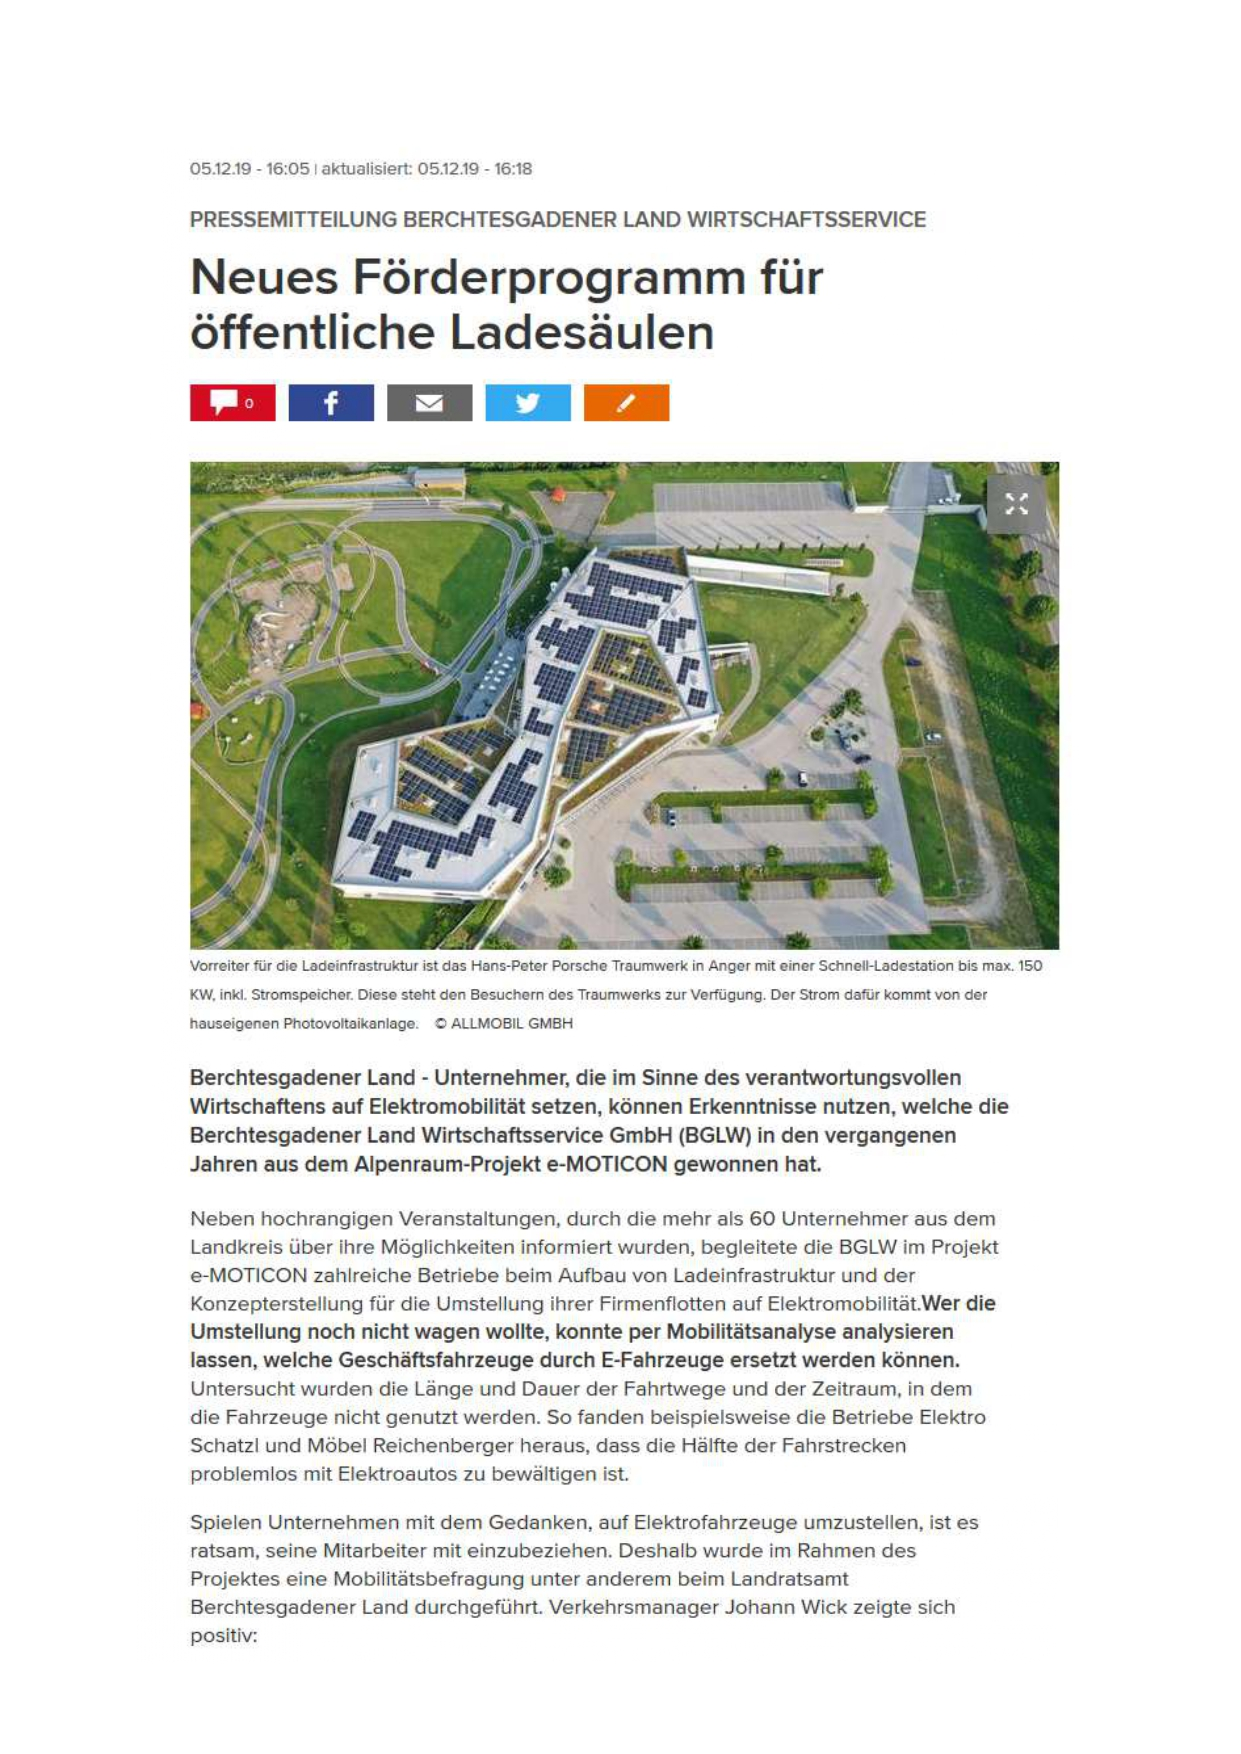 Emobilität im Berchtesgadener Land